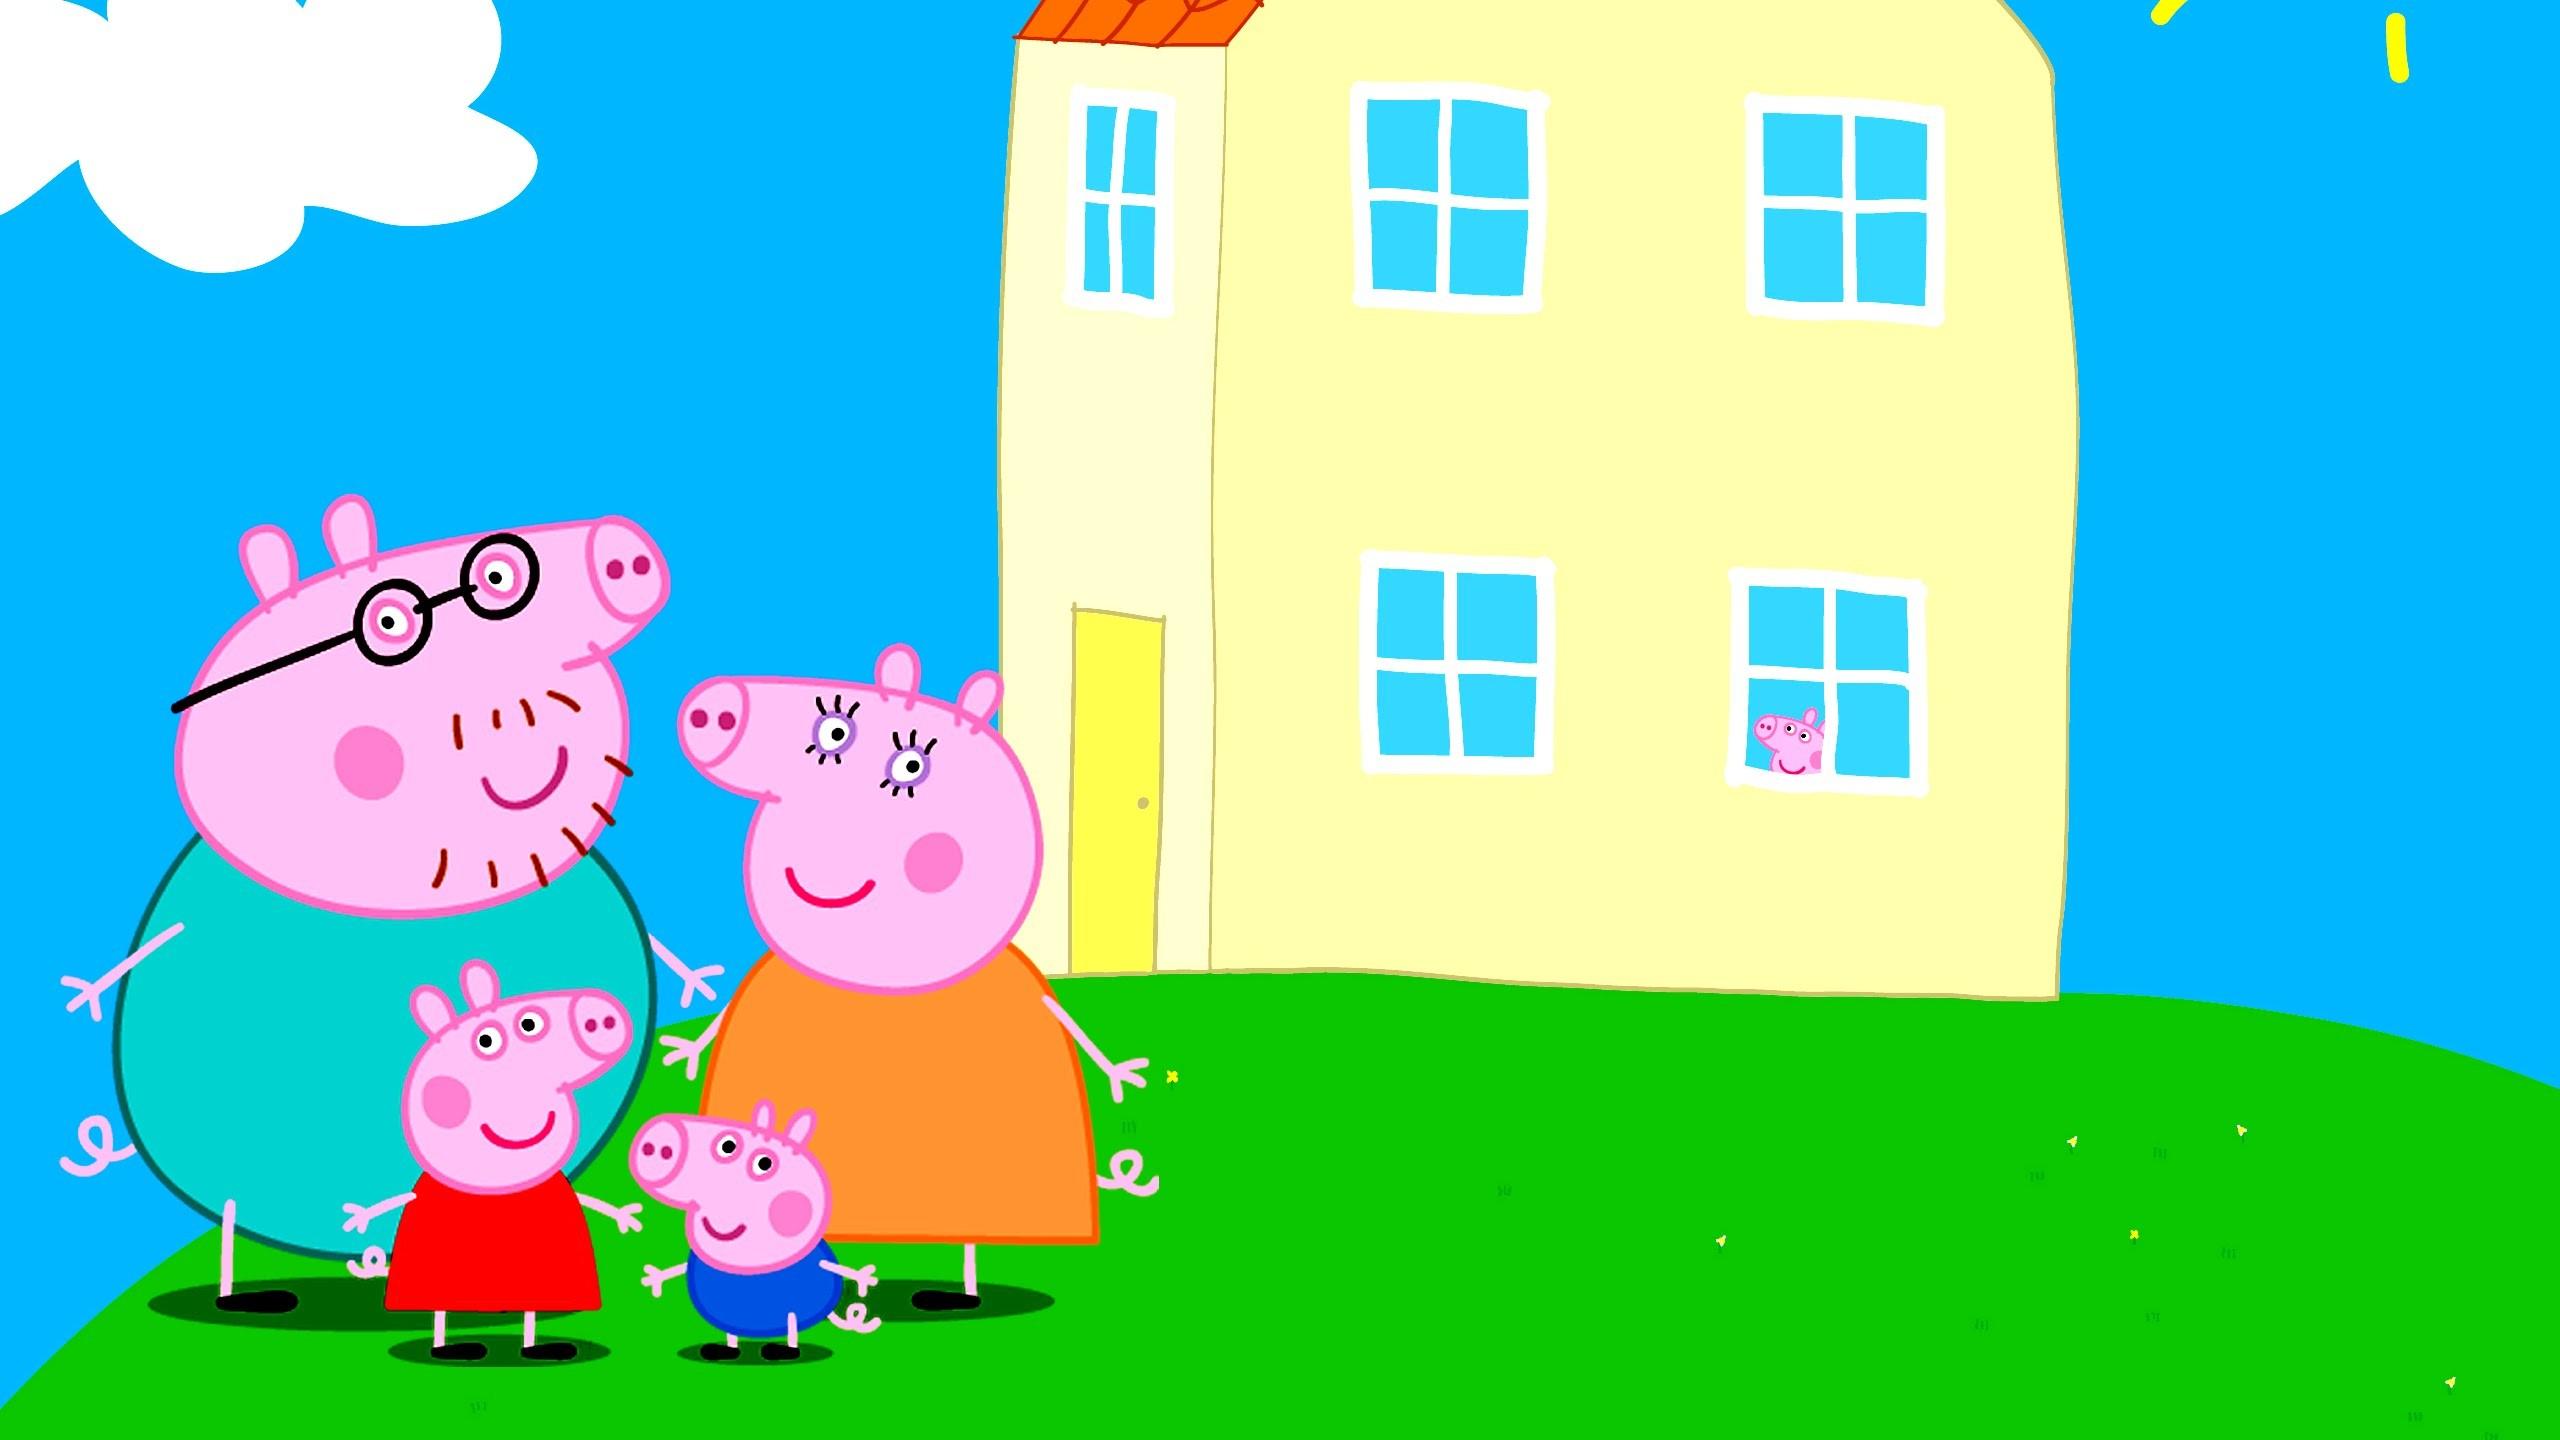 Peppa Pig Wallpaper 67 Images